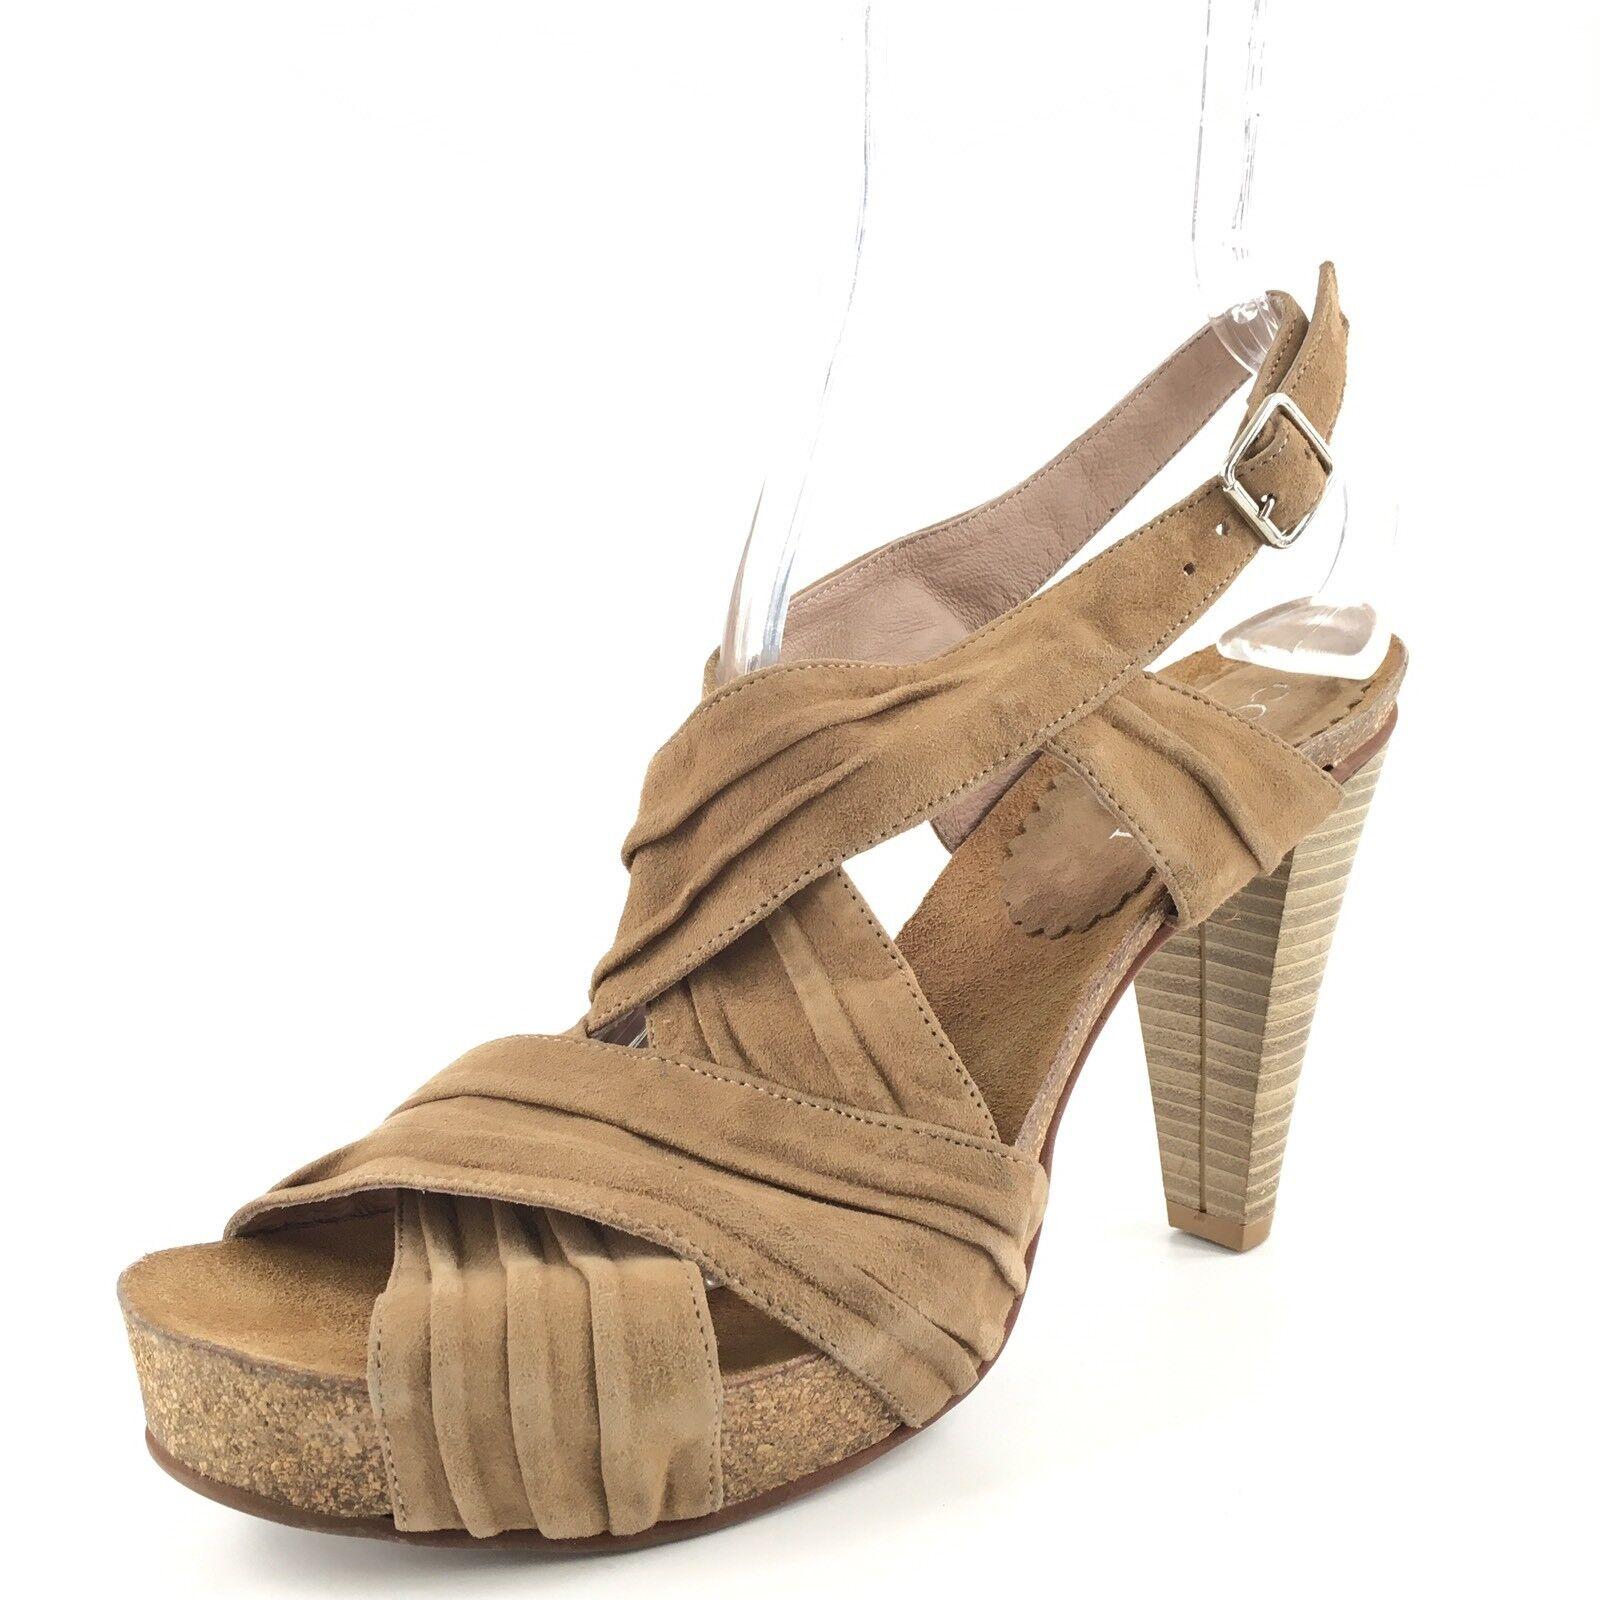 253 Cordani  Russel  Brown Suede Ankle Strap Platform Sandals Womens Size 40 M